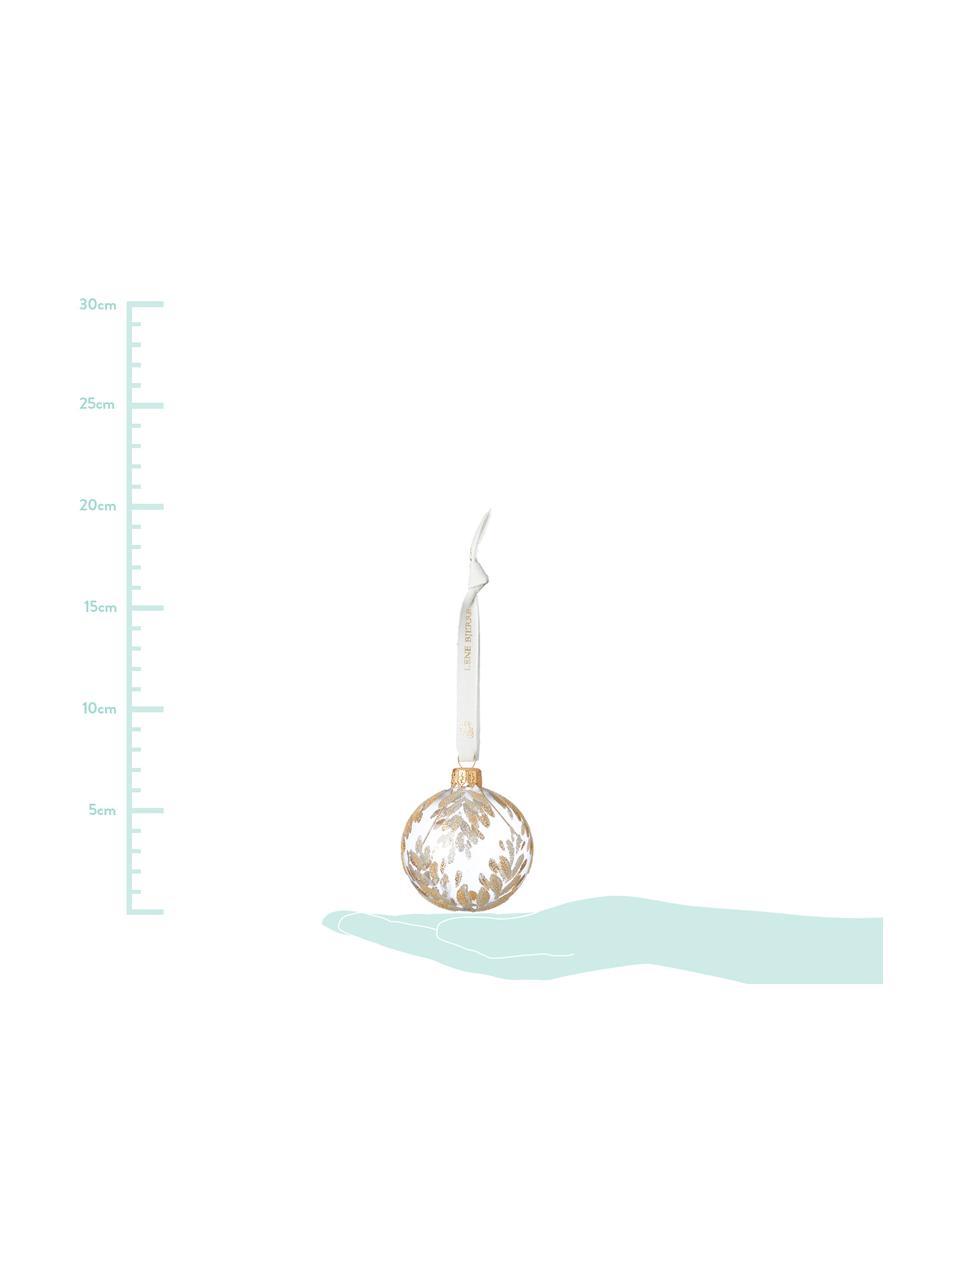 Palla di Natale Cadelia Ø 6 cm, 2 pz, Trasparente, dorato, Ø 6 cm